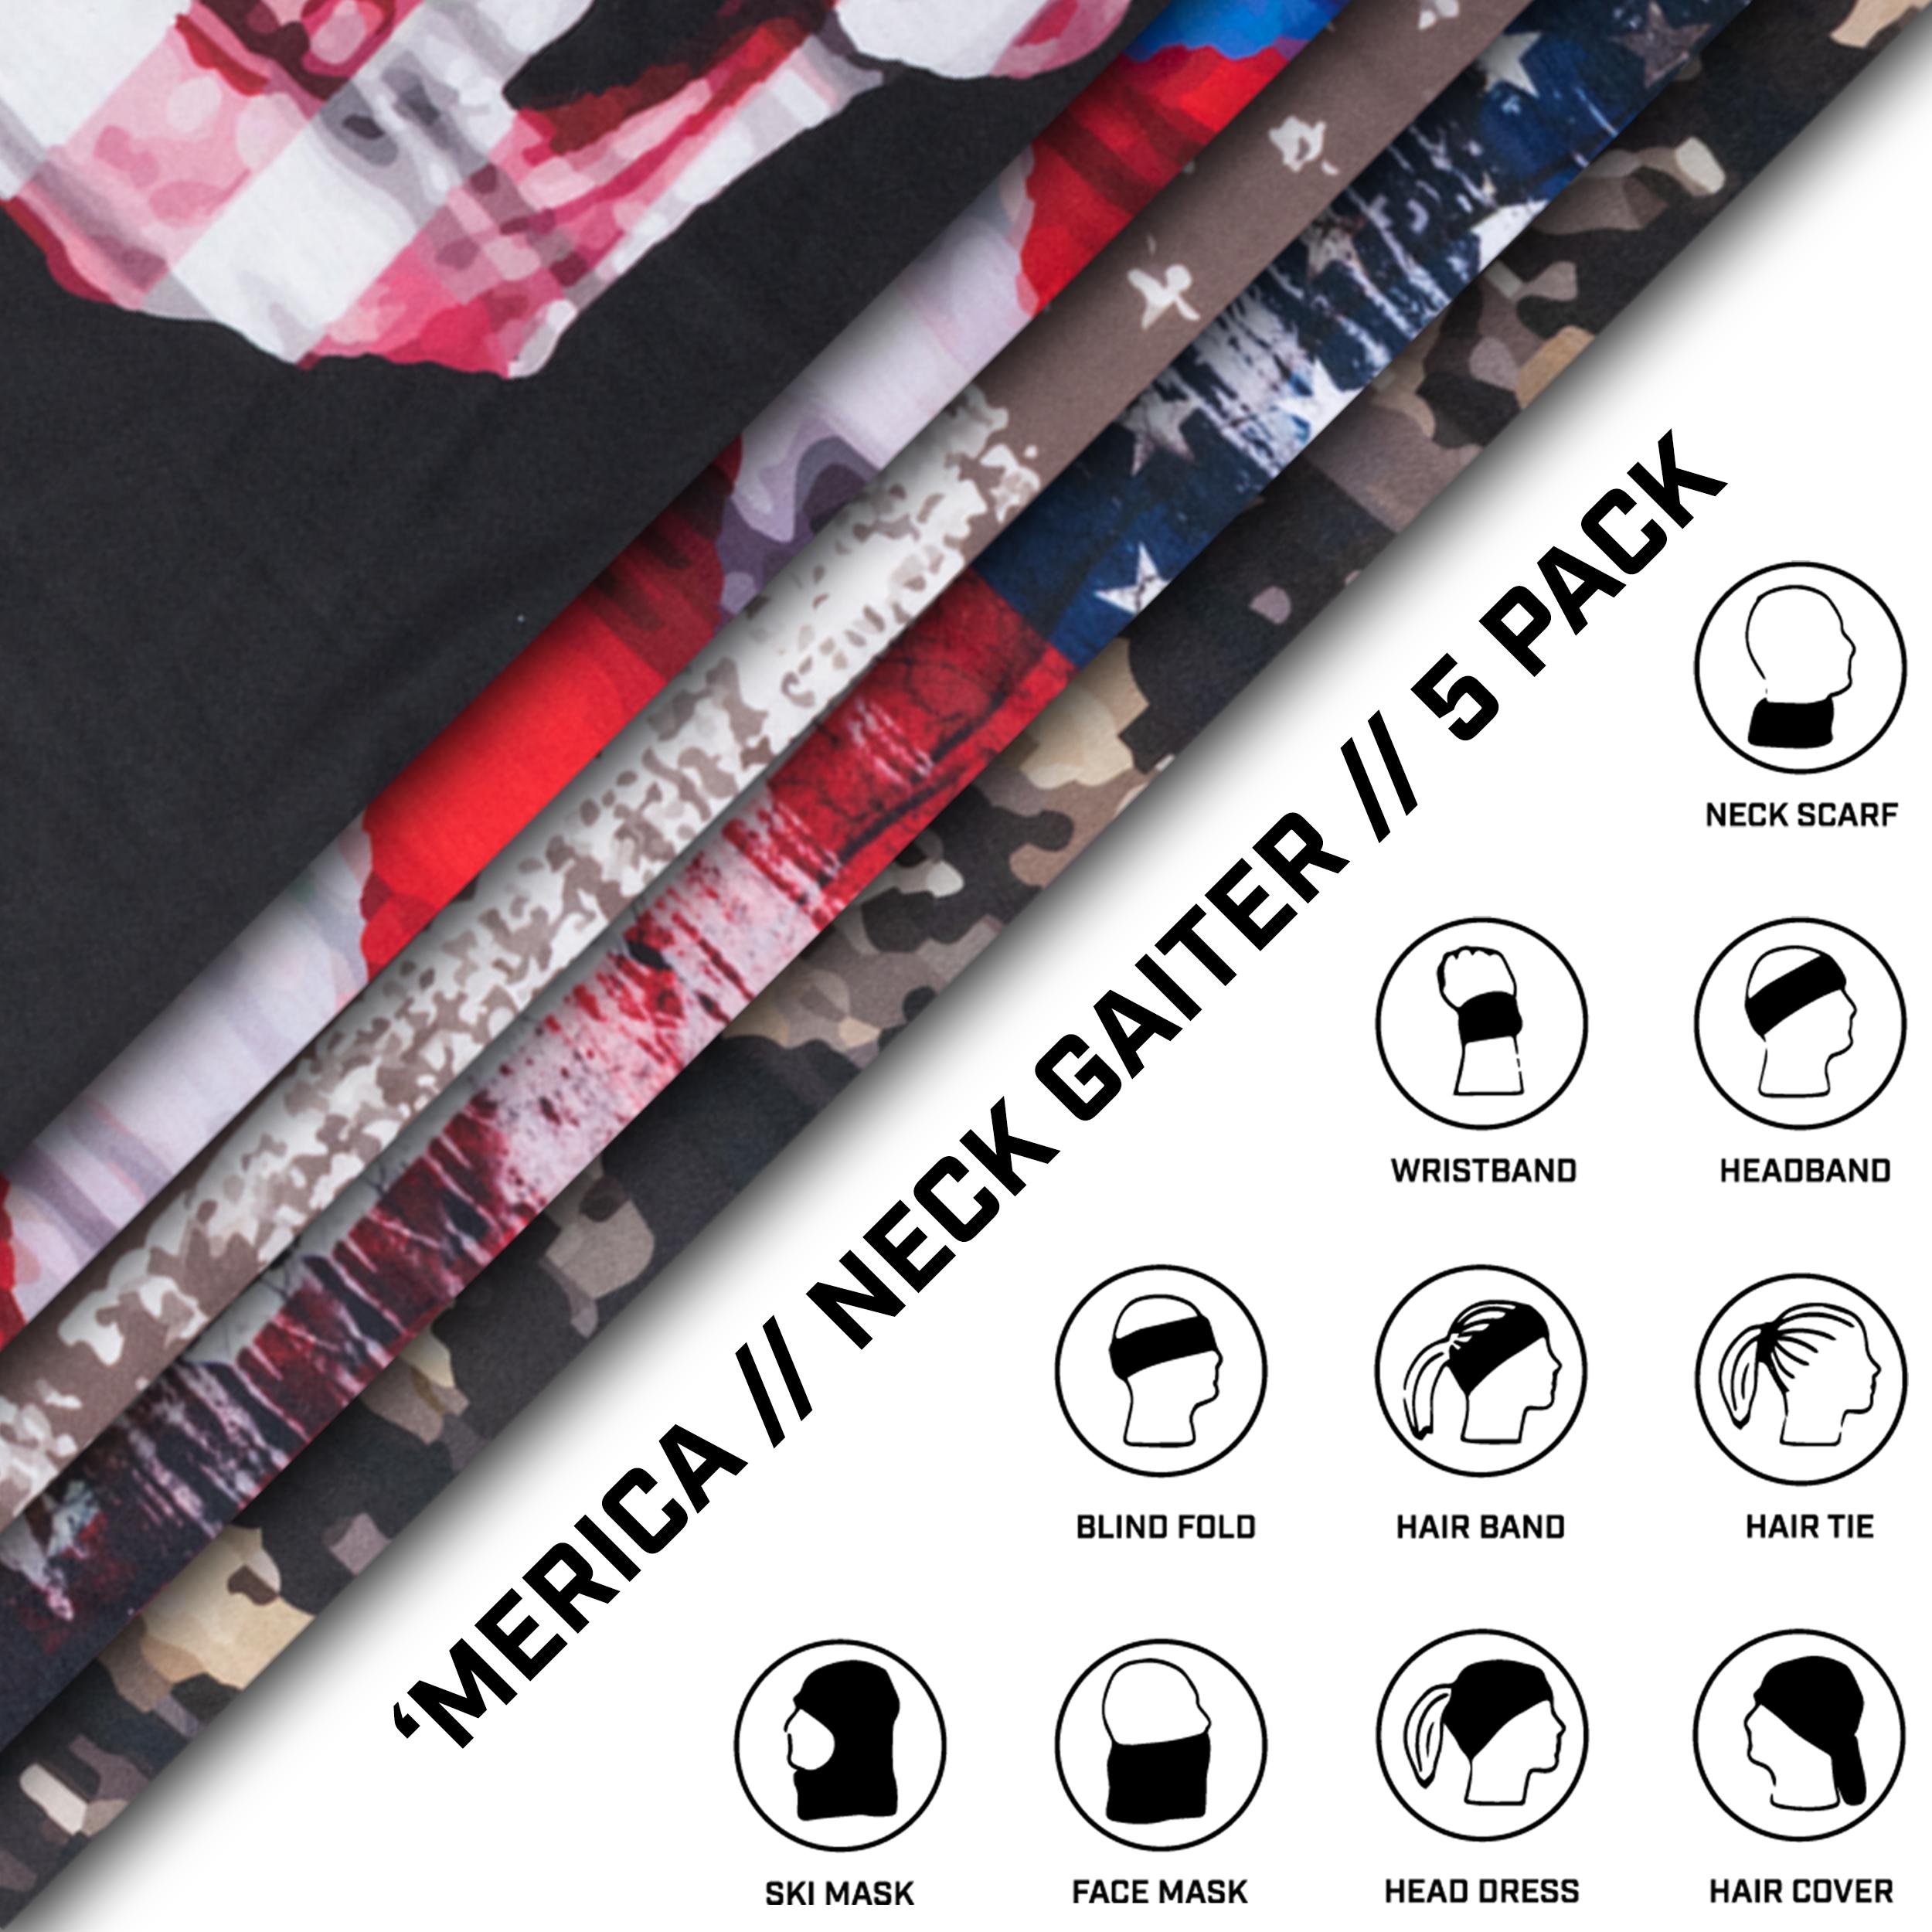 Neck Gaiter 5 Pack - 'Merica